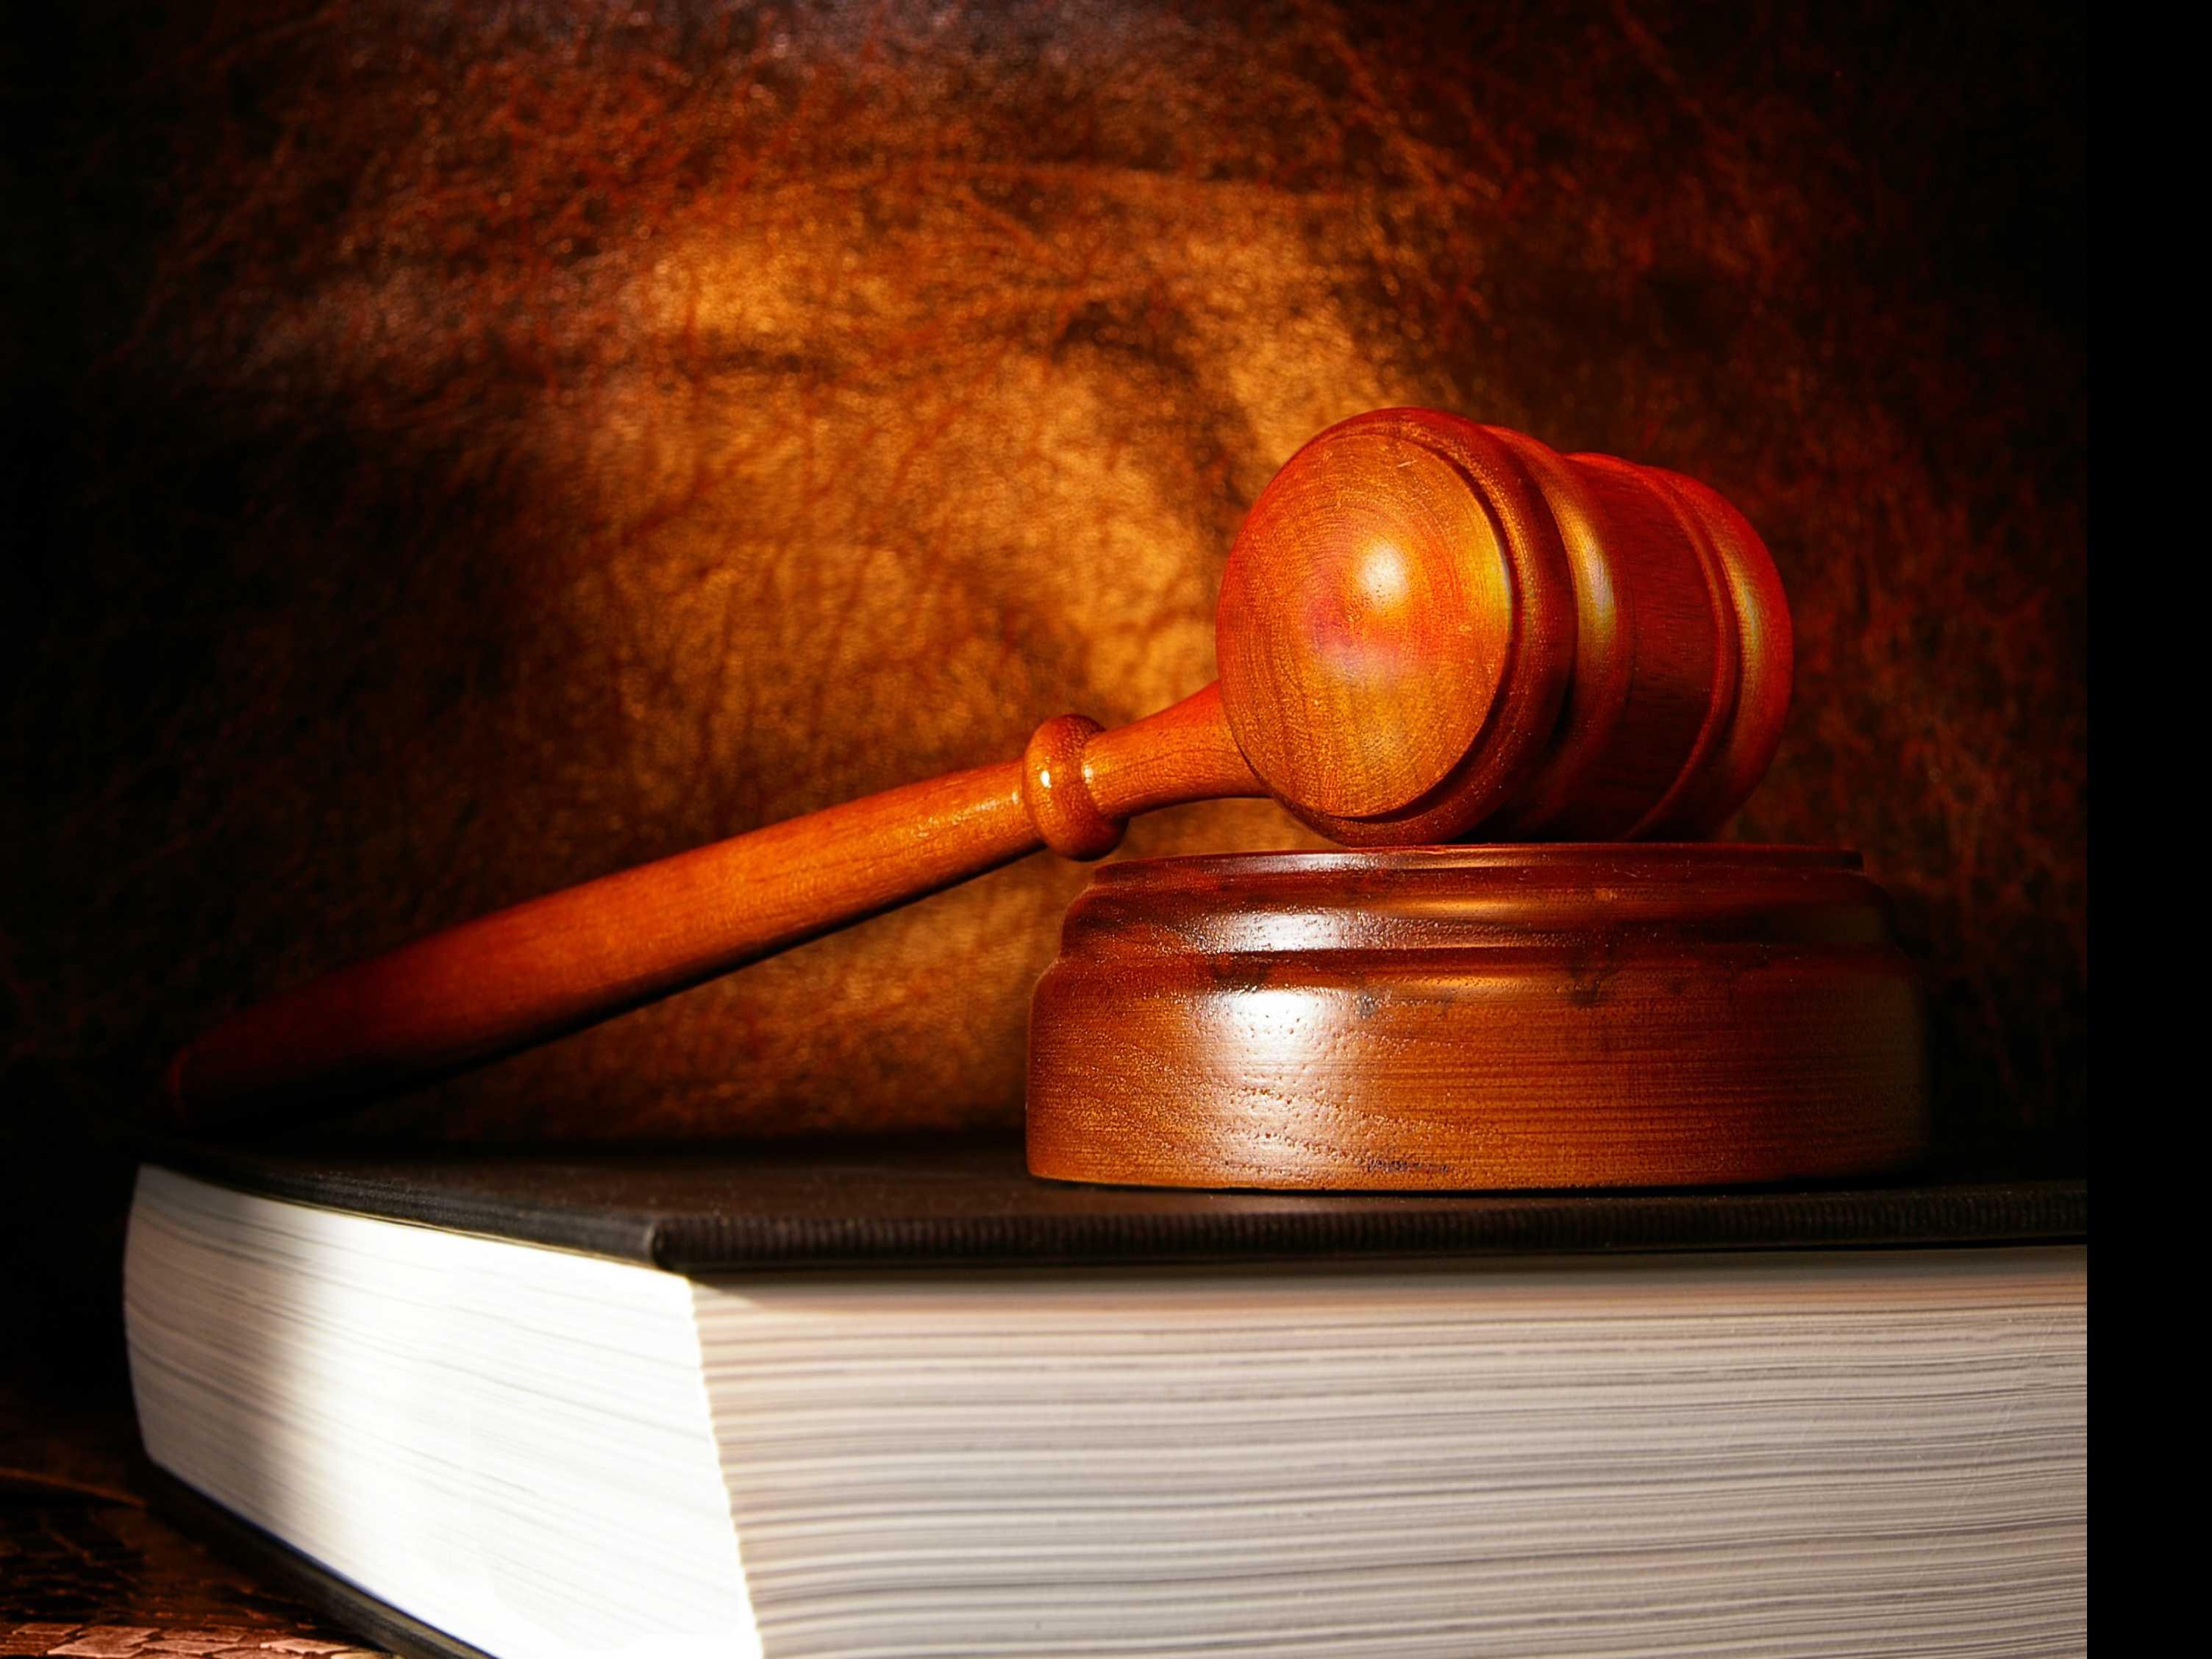 DC Man Sentenced to 30 Years for Killing Transgender Woman